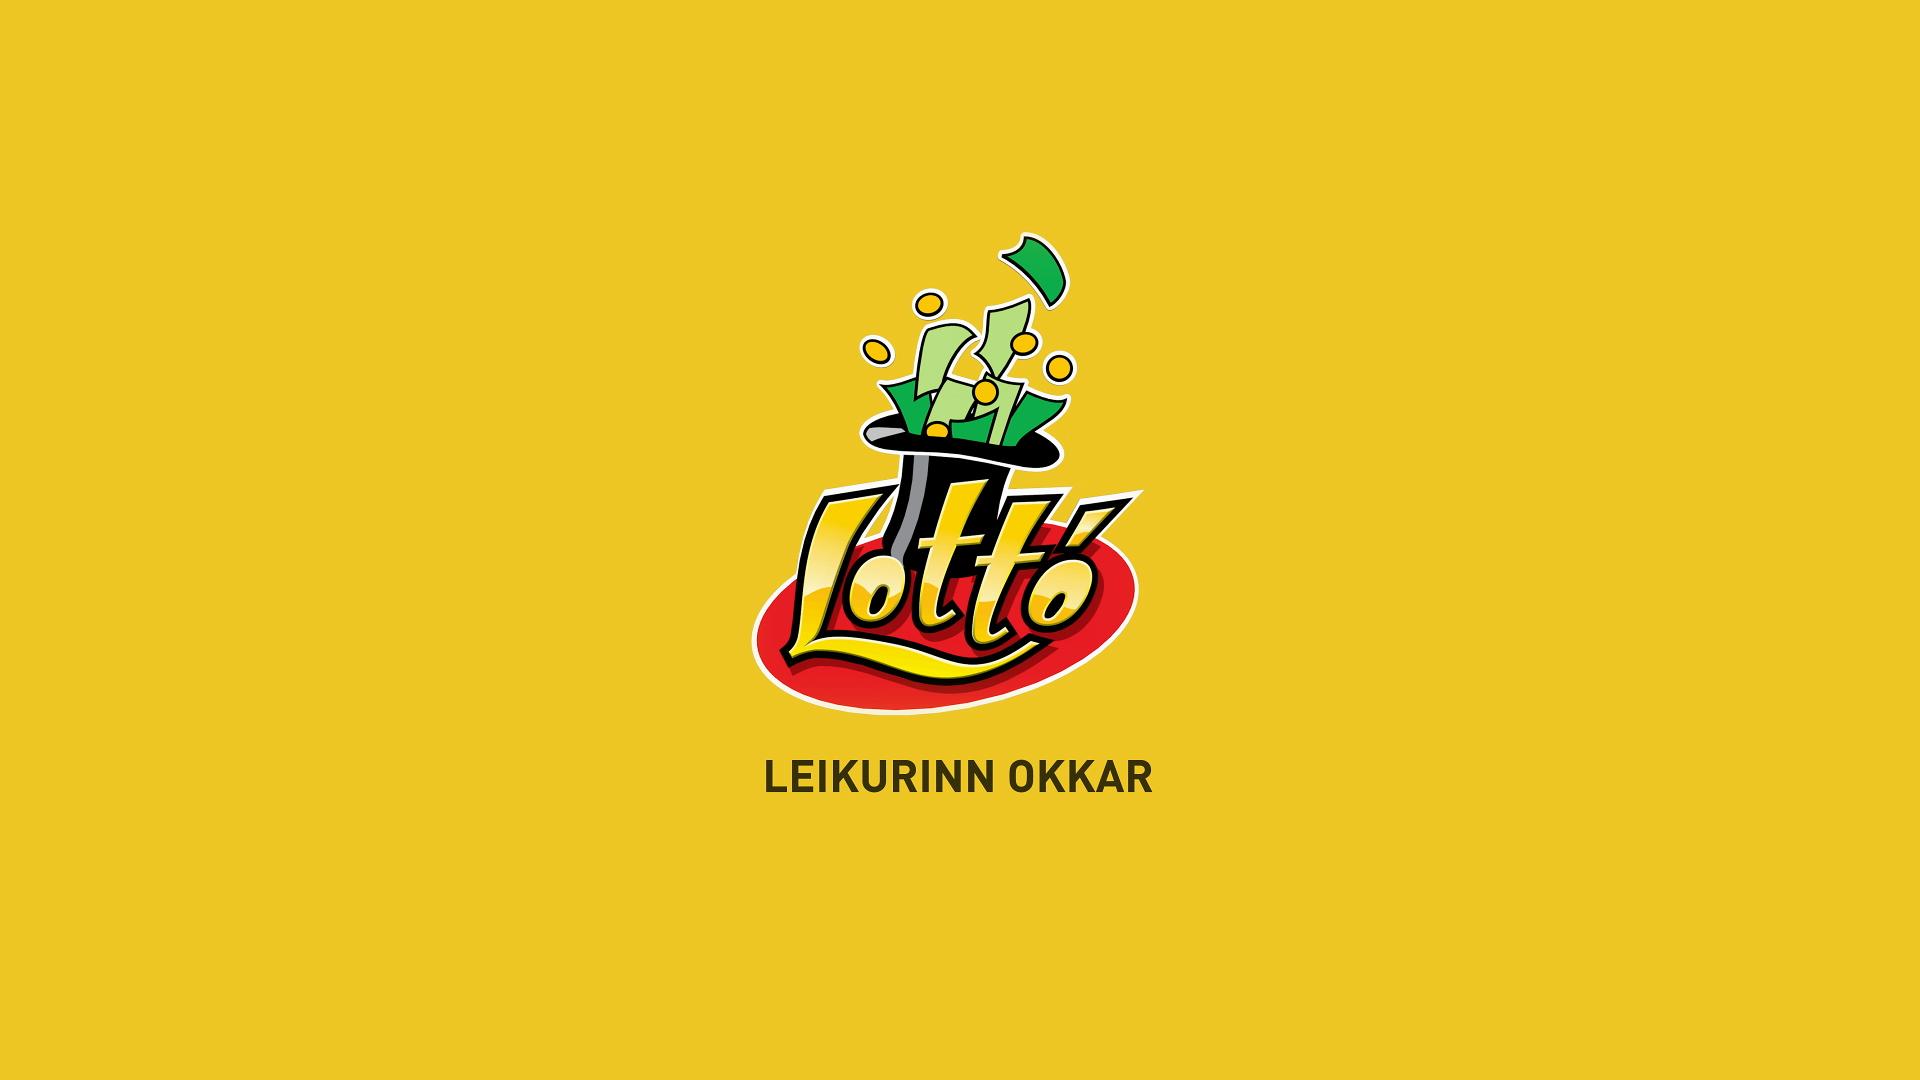 Lotto_LeikurinnOkkar_22.jpg